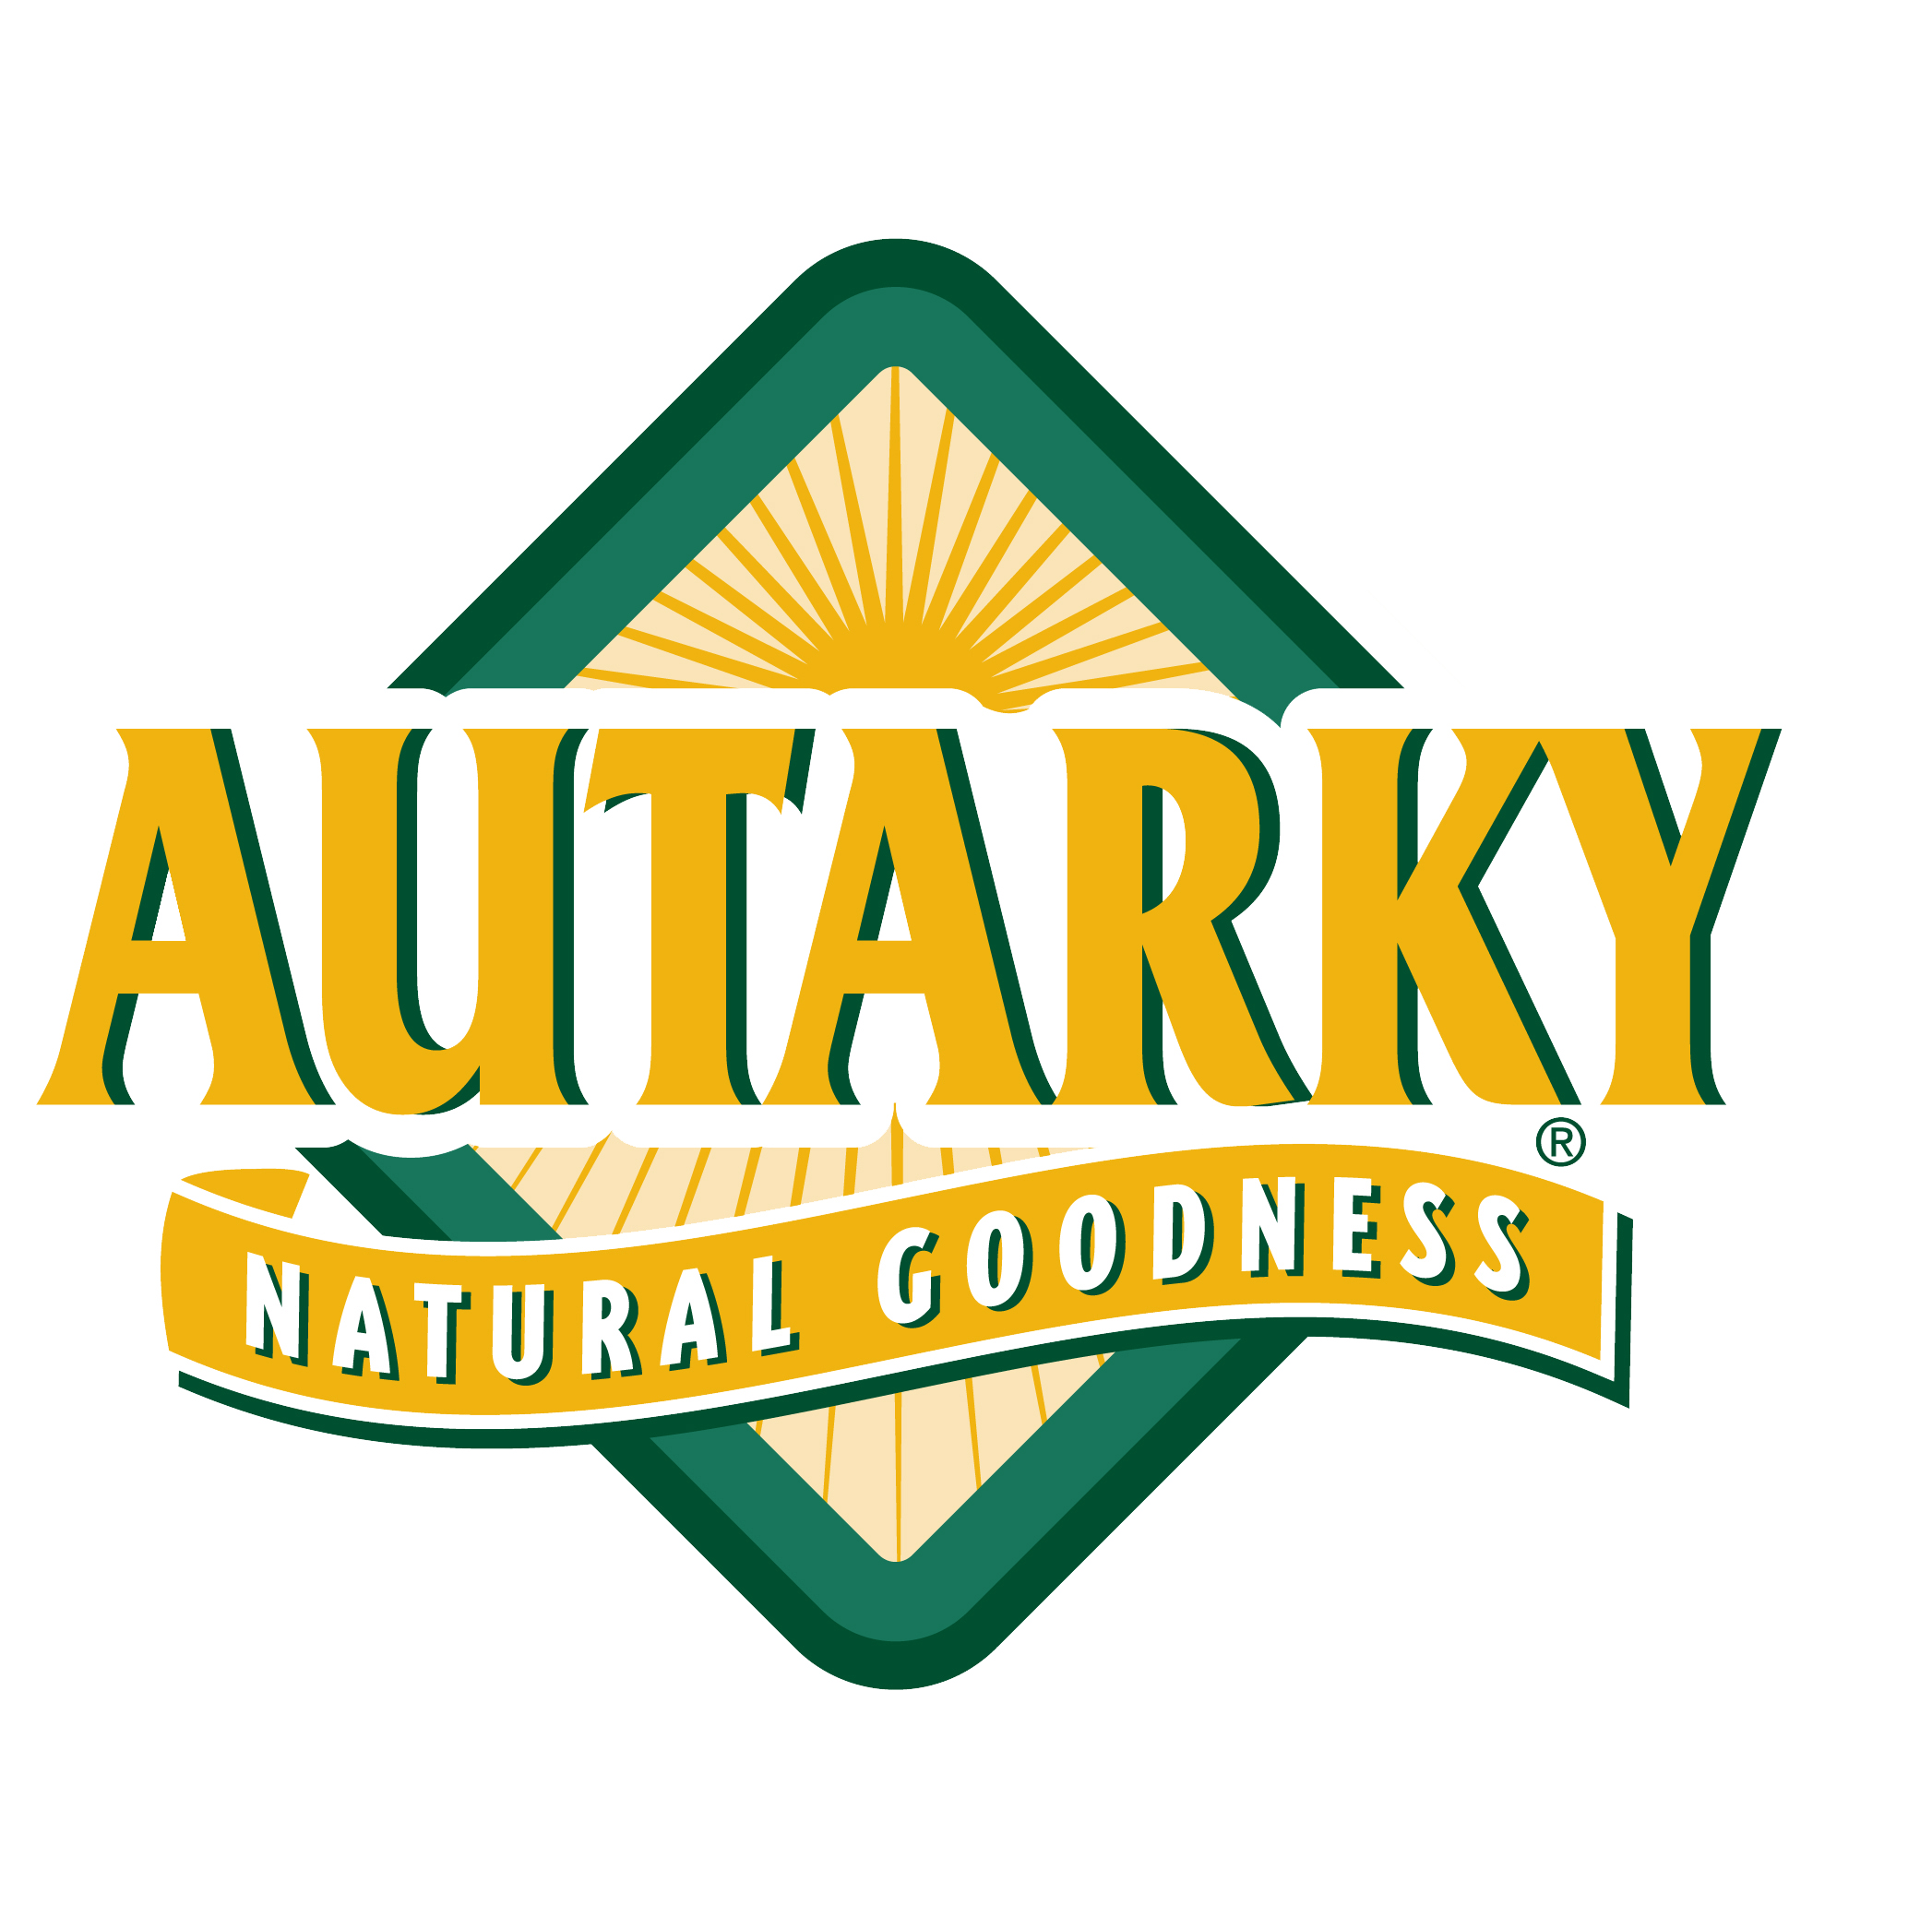 https://www.sealsfodder.co.uk/wp-content/uploads/2018/10/Autarky-logo.jpg